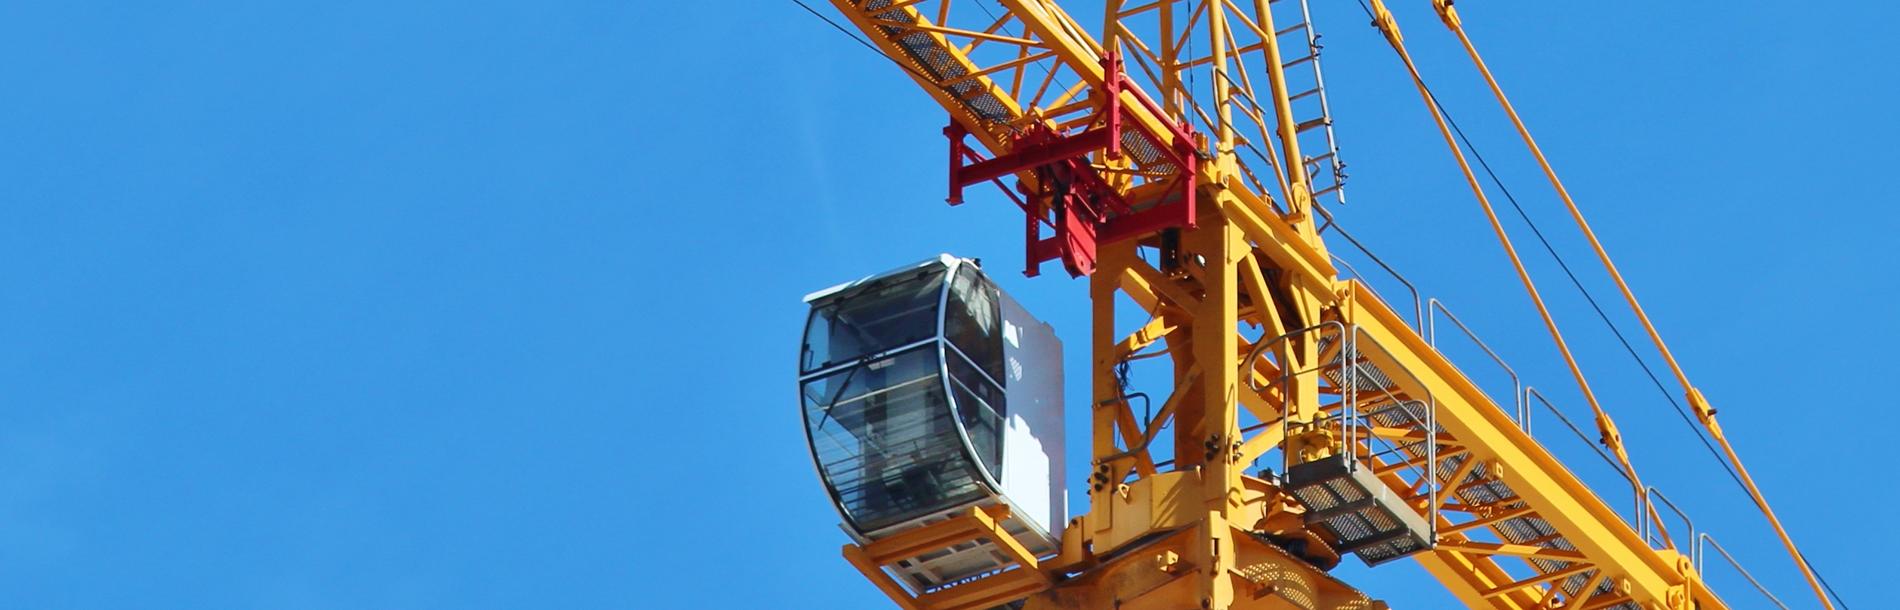 slider3-crane